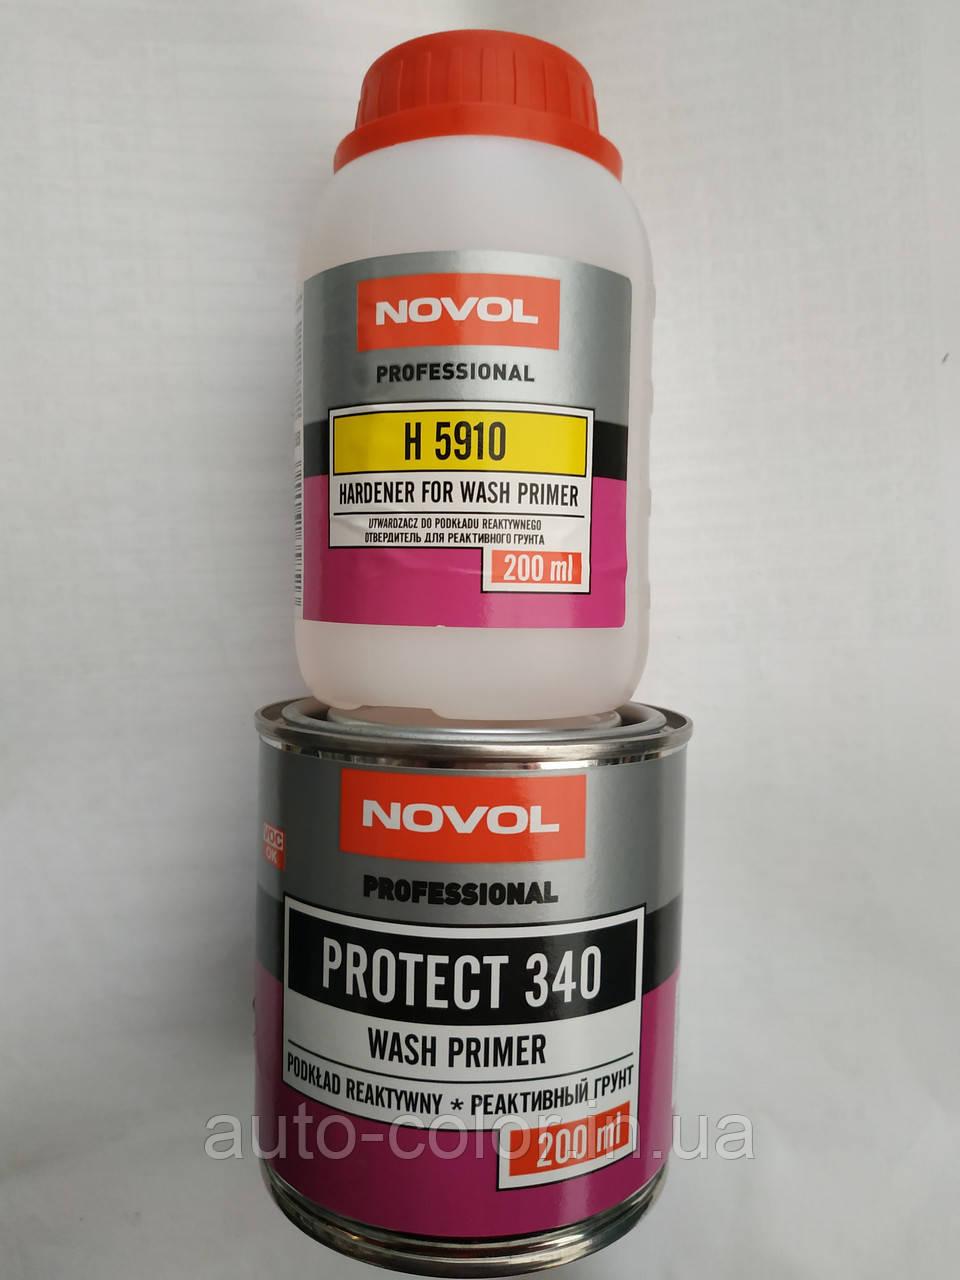 Novol PROTEKT 340 Реактивний грунт WASHPRIMER 0.2 л+0.2 л